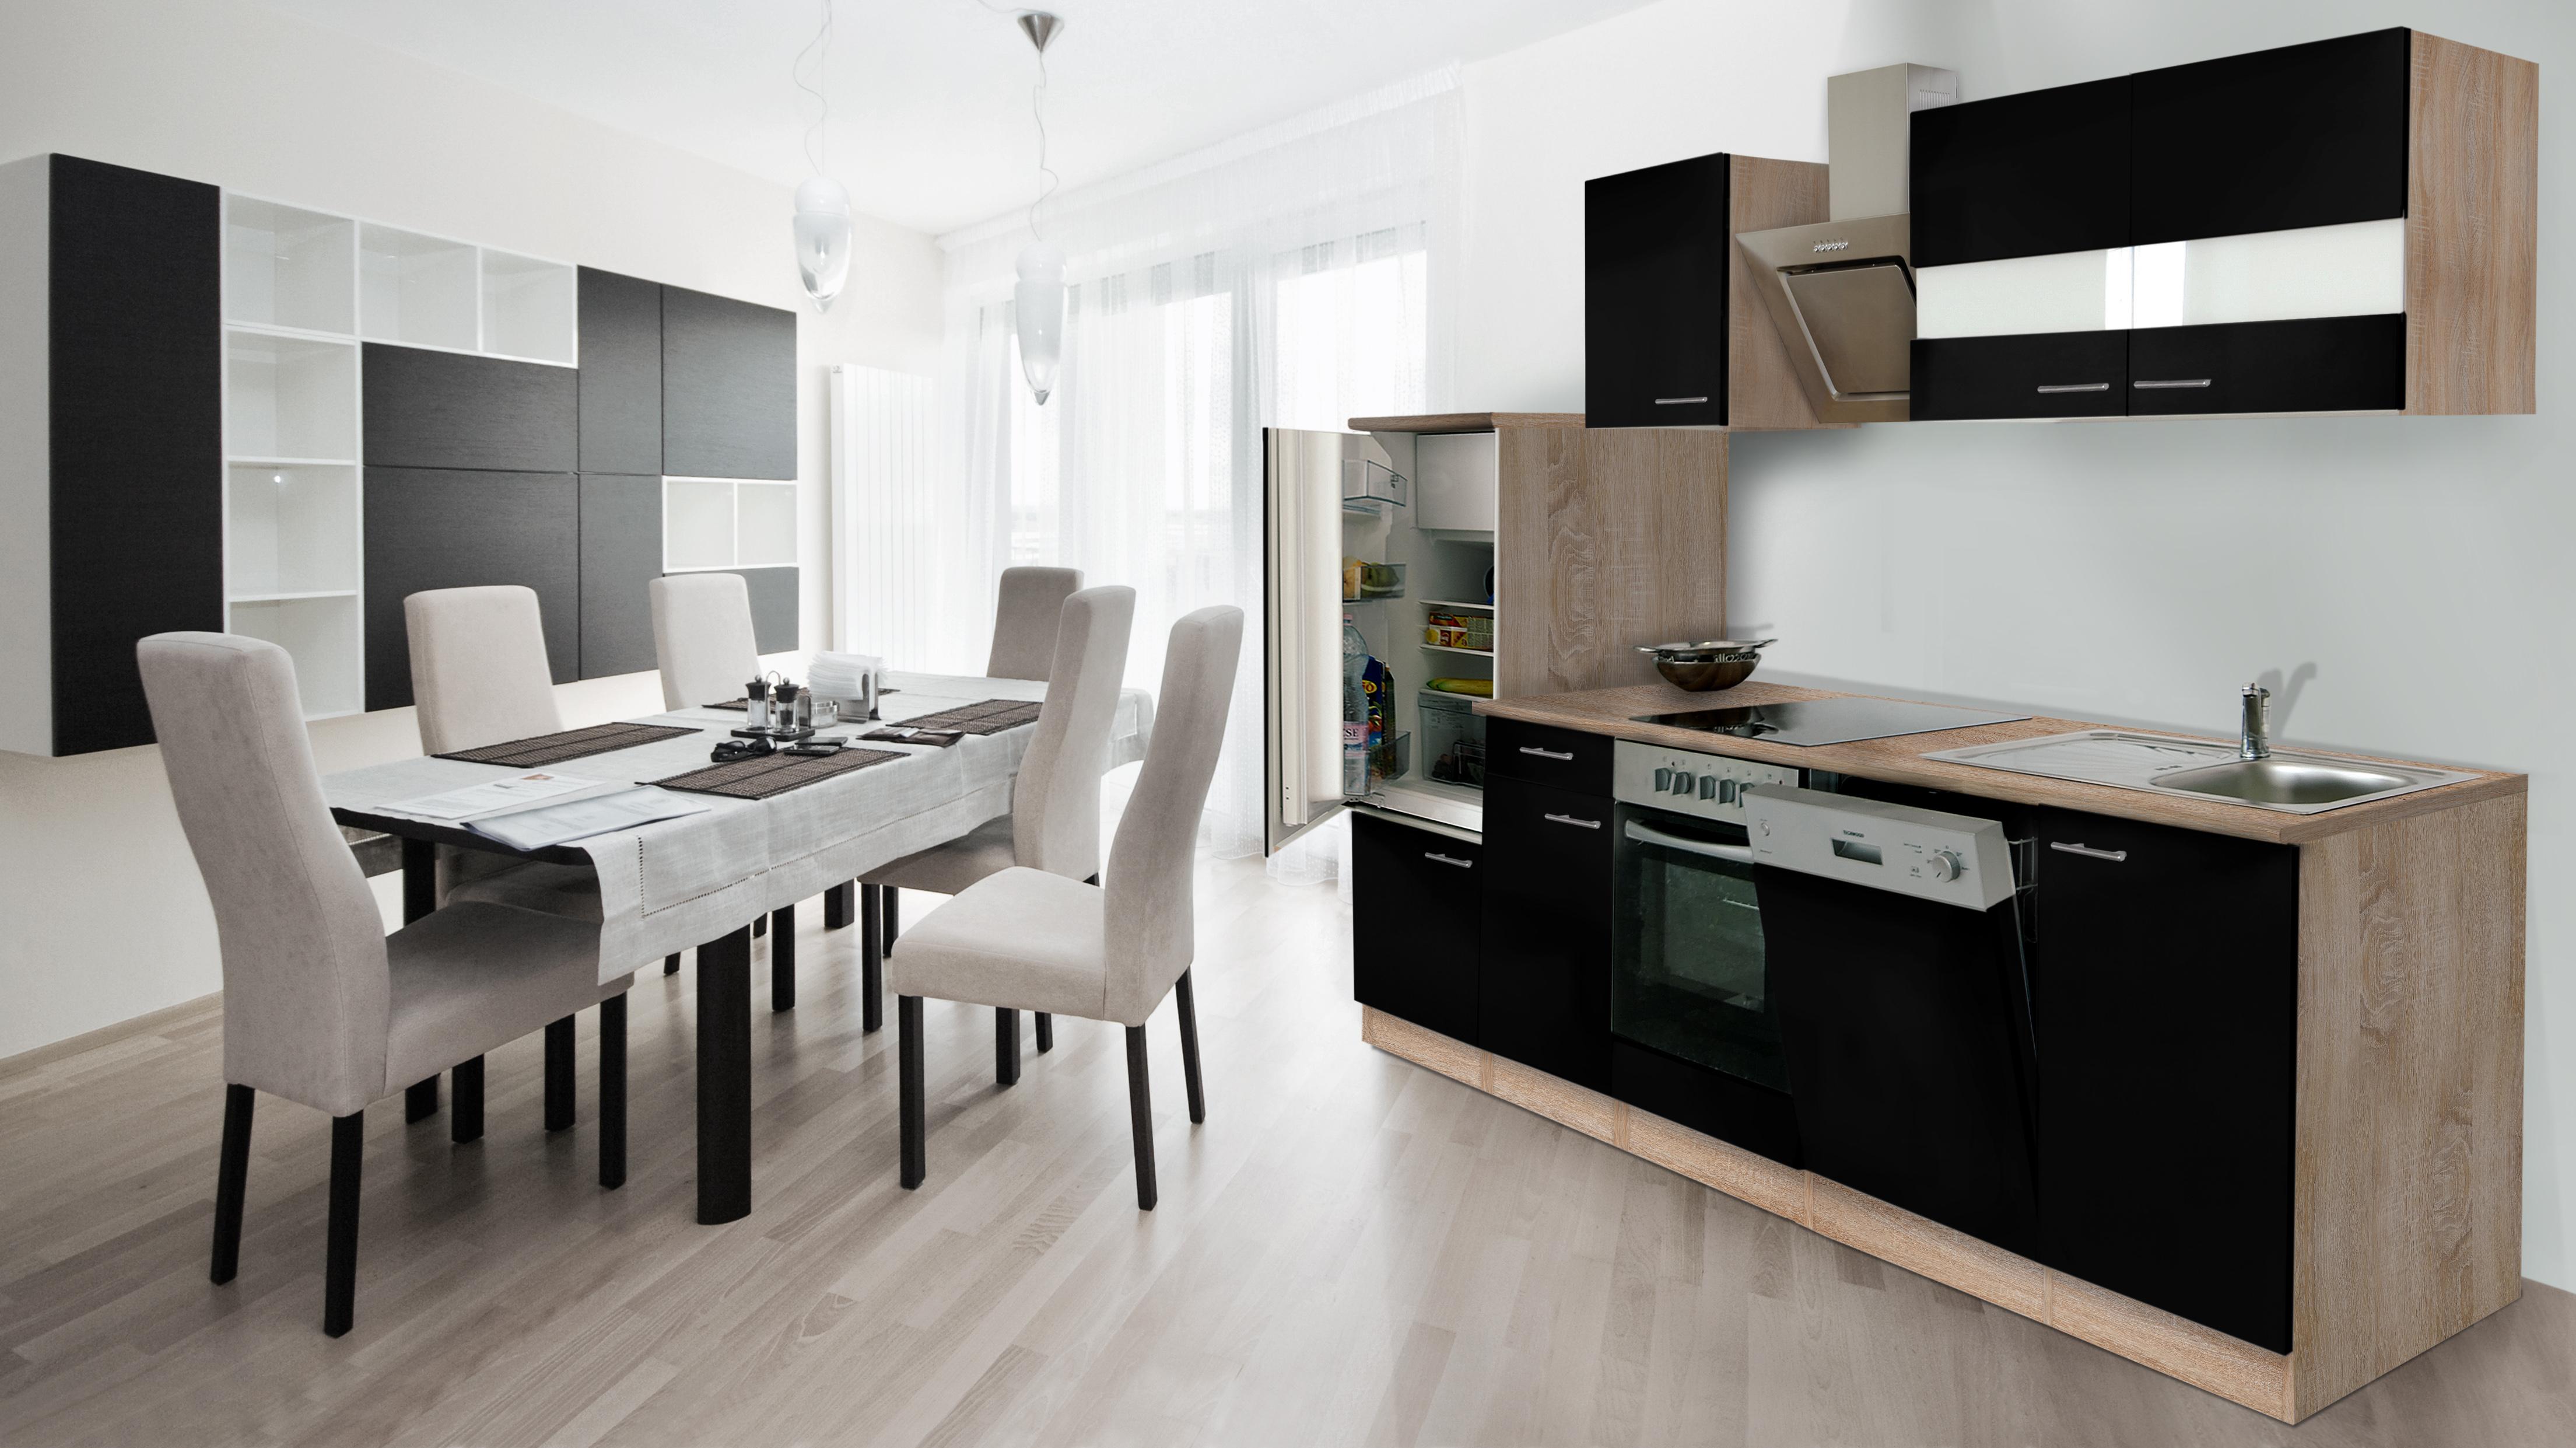 RESPEKTA cucina componibile BLOCCO cucina angolo cucina 280 cm | eBay